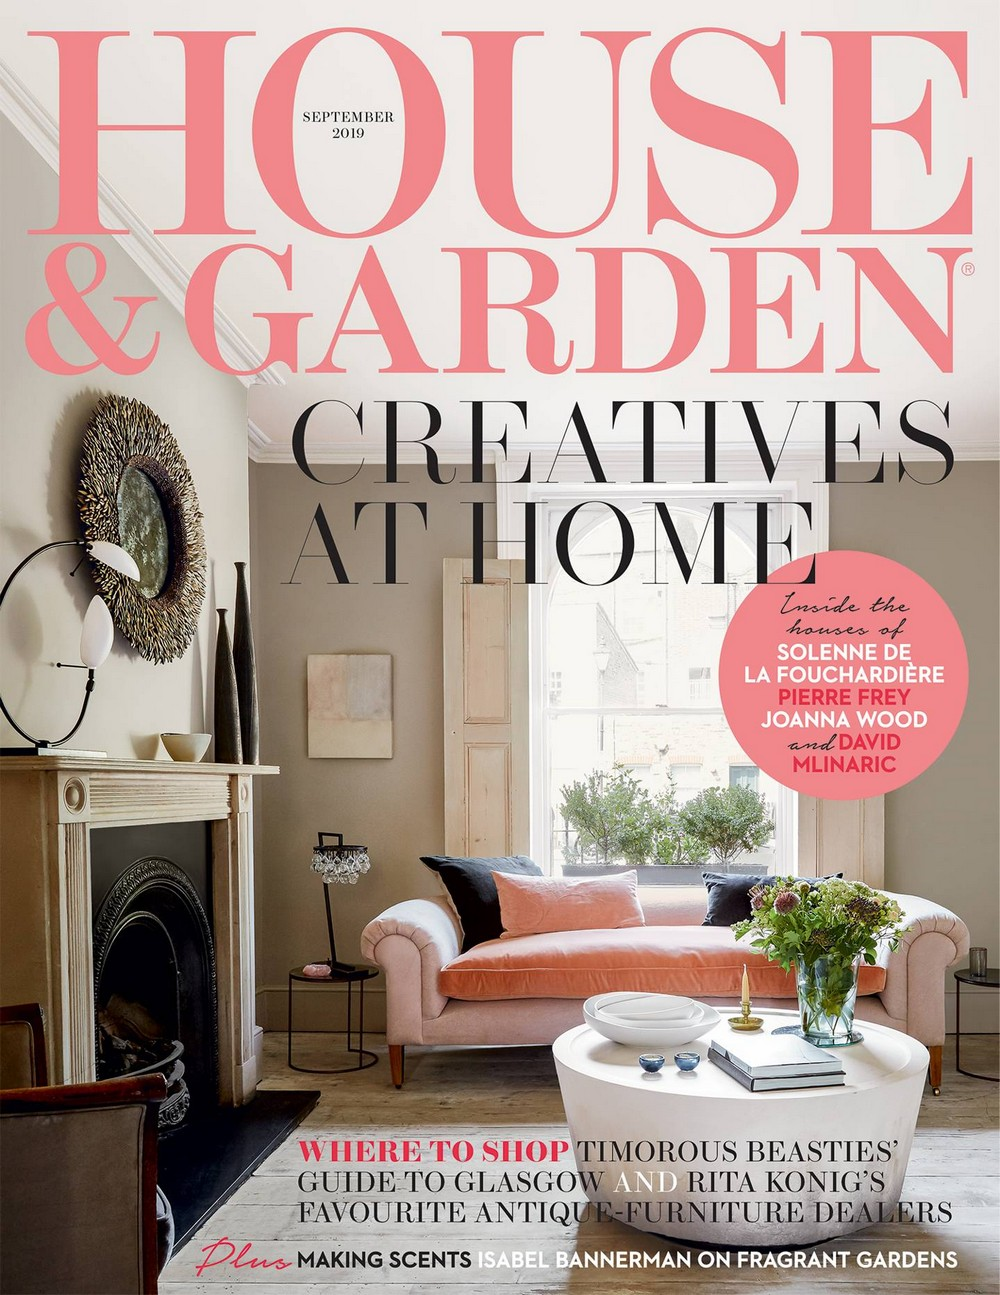 Find The 10 Best Interior Design Magazines For September! interior design magazines Find The 10  Best Interior Design Magazines For September! Find The 10 Best Interior Design Magazines For September 5